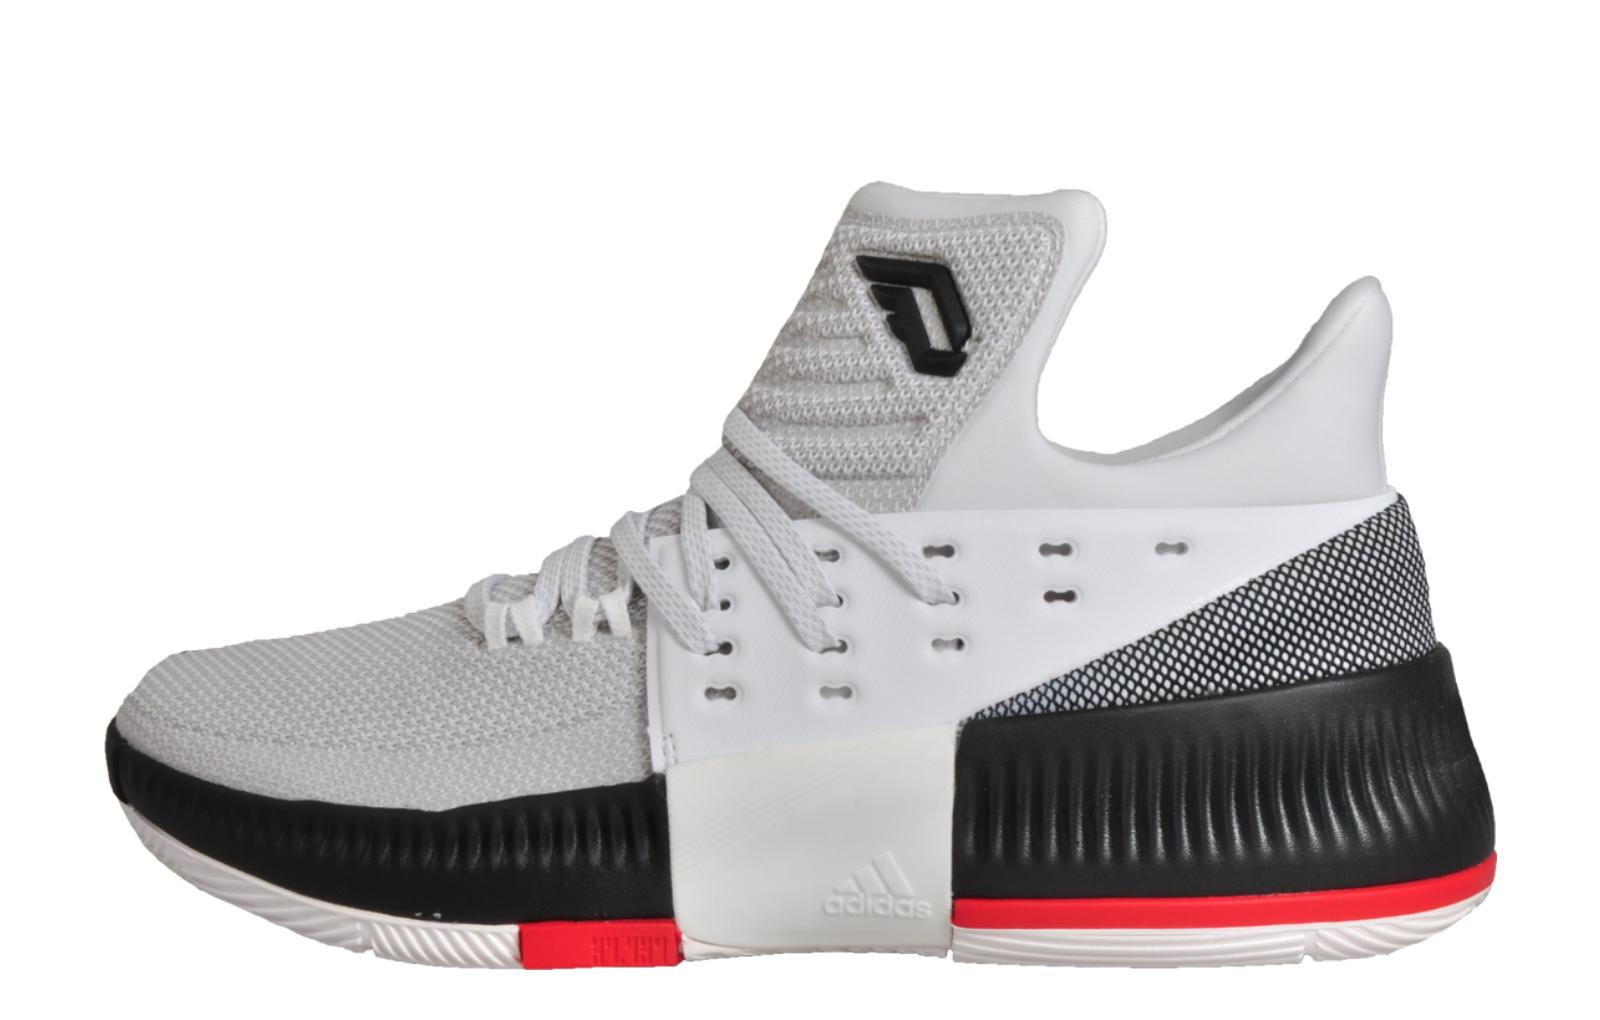 cheaper 68452 0b592 Adidas Damian Lillard 3 Mens Crazy Time Basketball CourtTrainers White